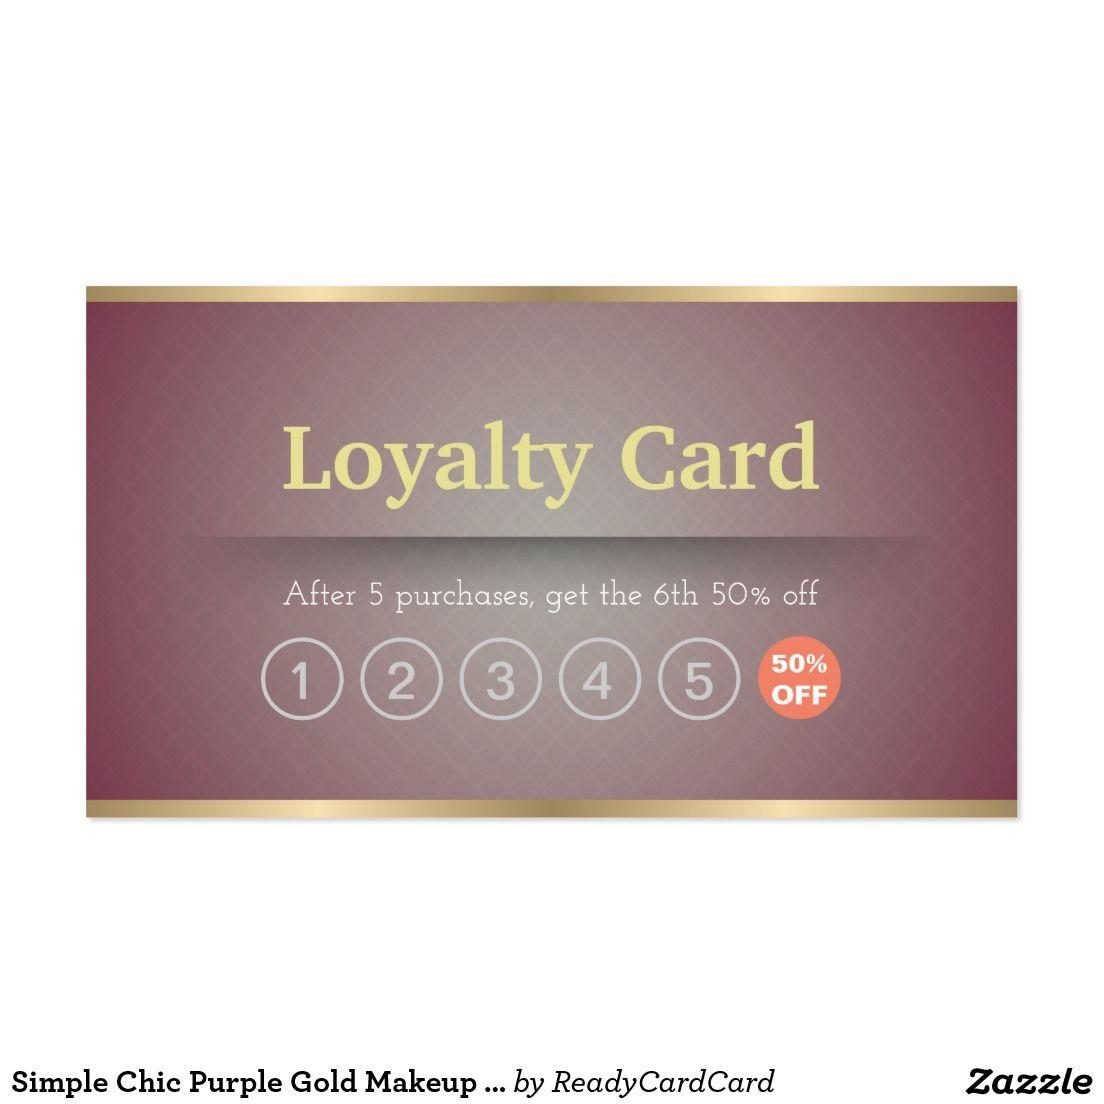 Simple Chic Purple Gold Makeup Hair Salon Loyalty Business Card ...